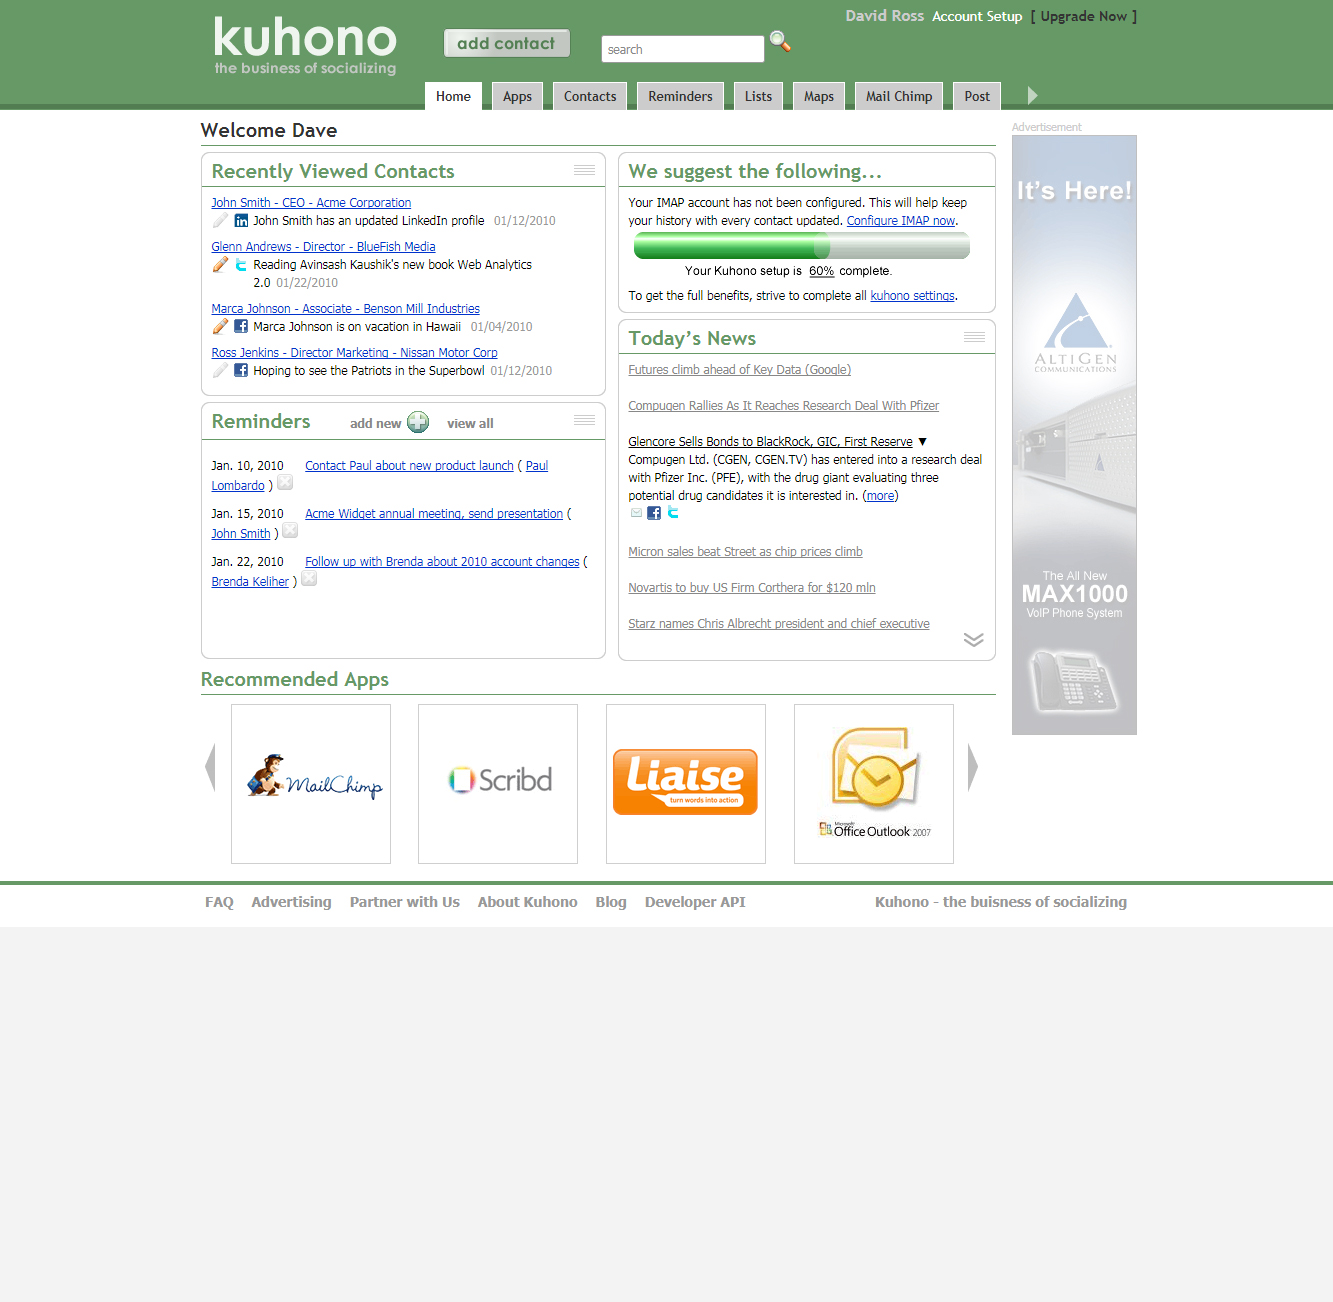 Kuhono home